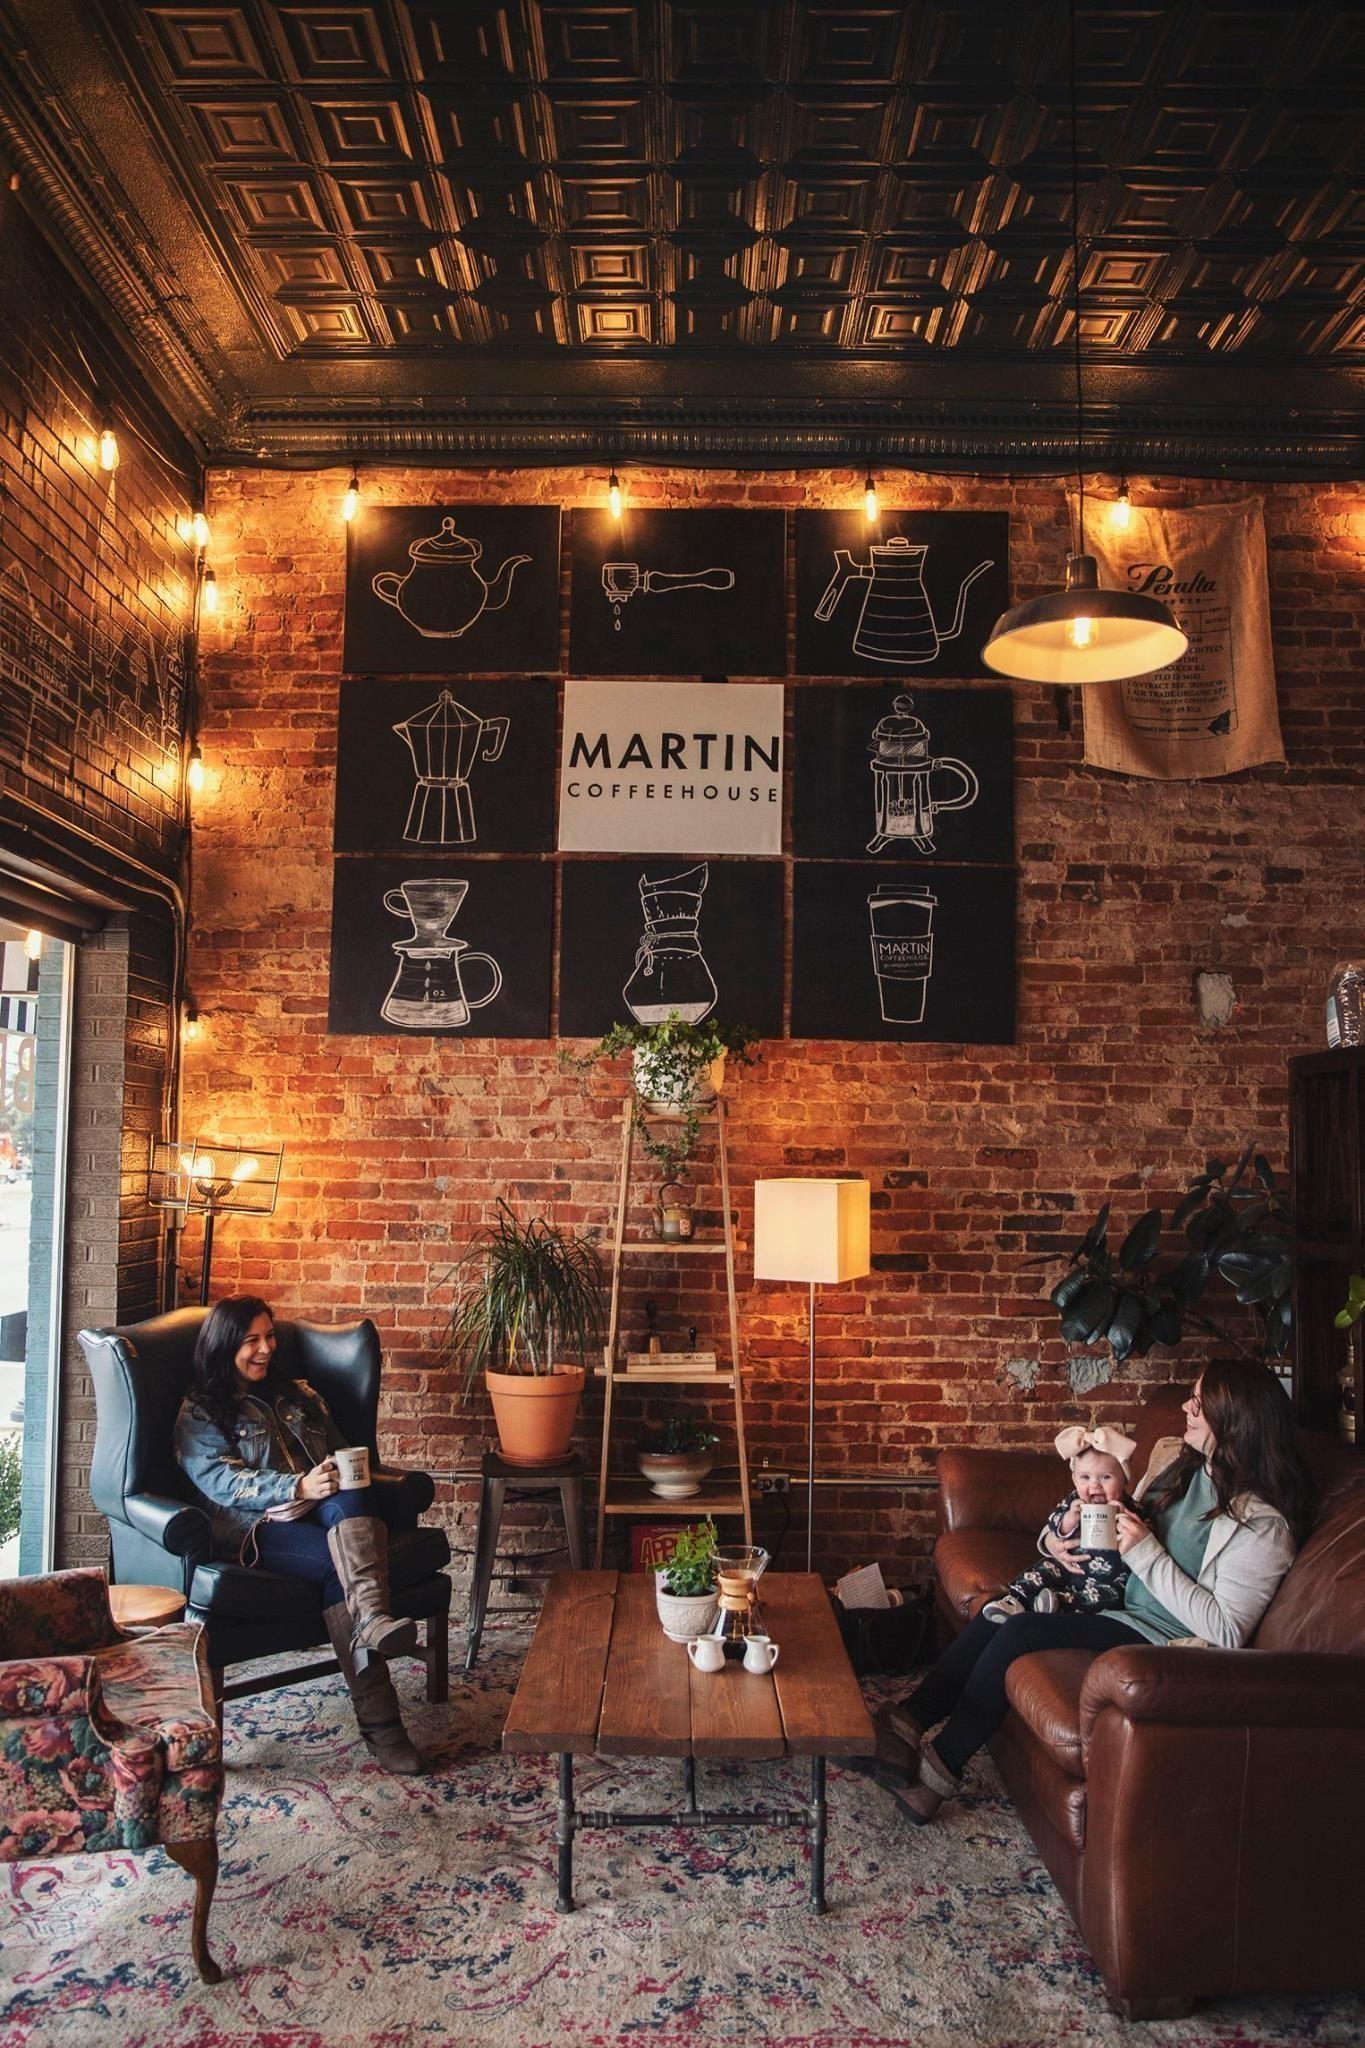 30 Stunning Coffee Shop Design Ideas That Most Inspiring In 2020 Coffee Shop Decor Coffee Shop Design Cozy Coffee Shop